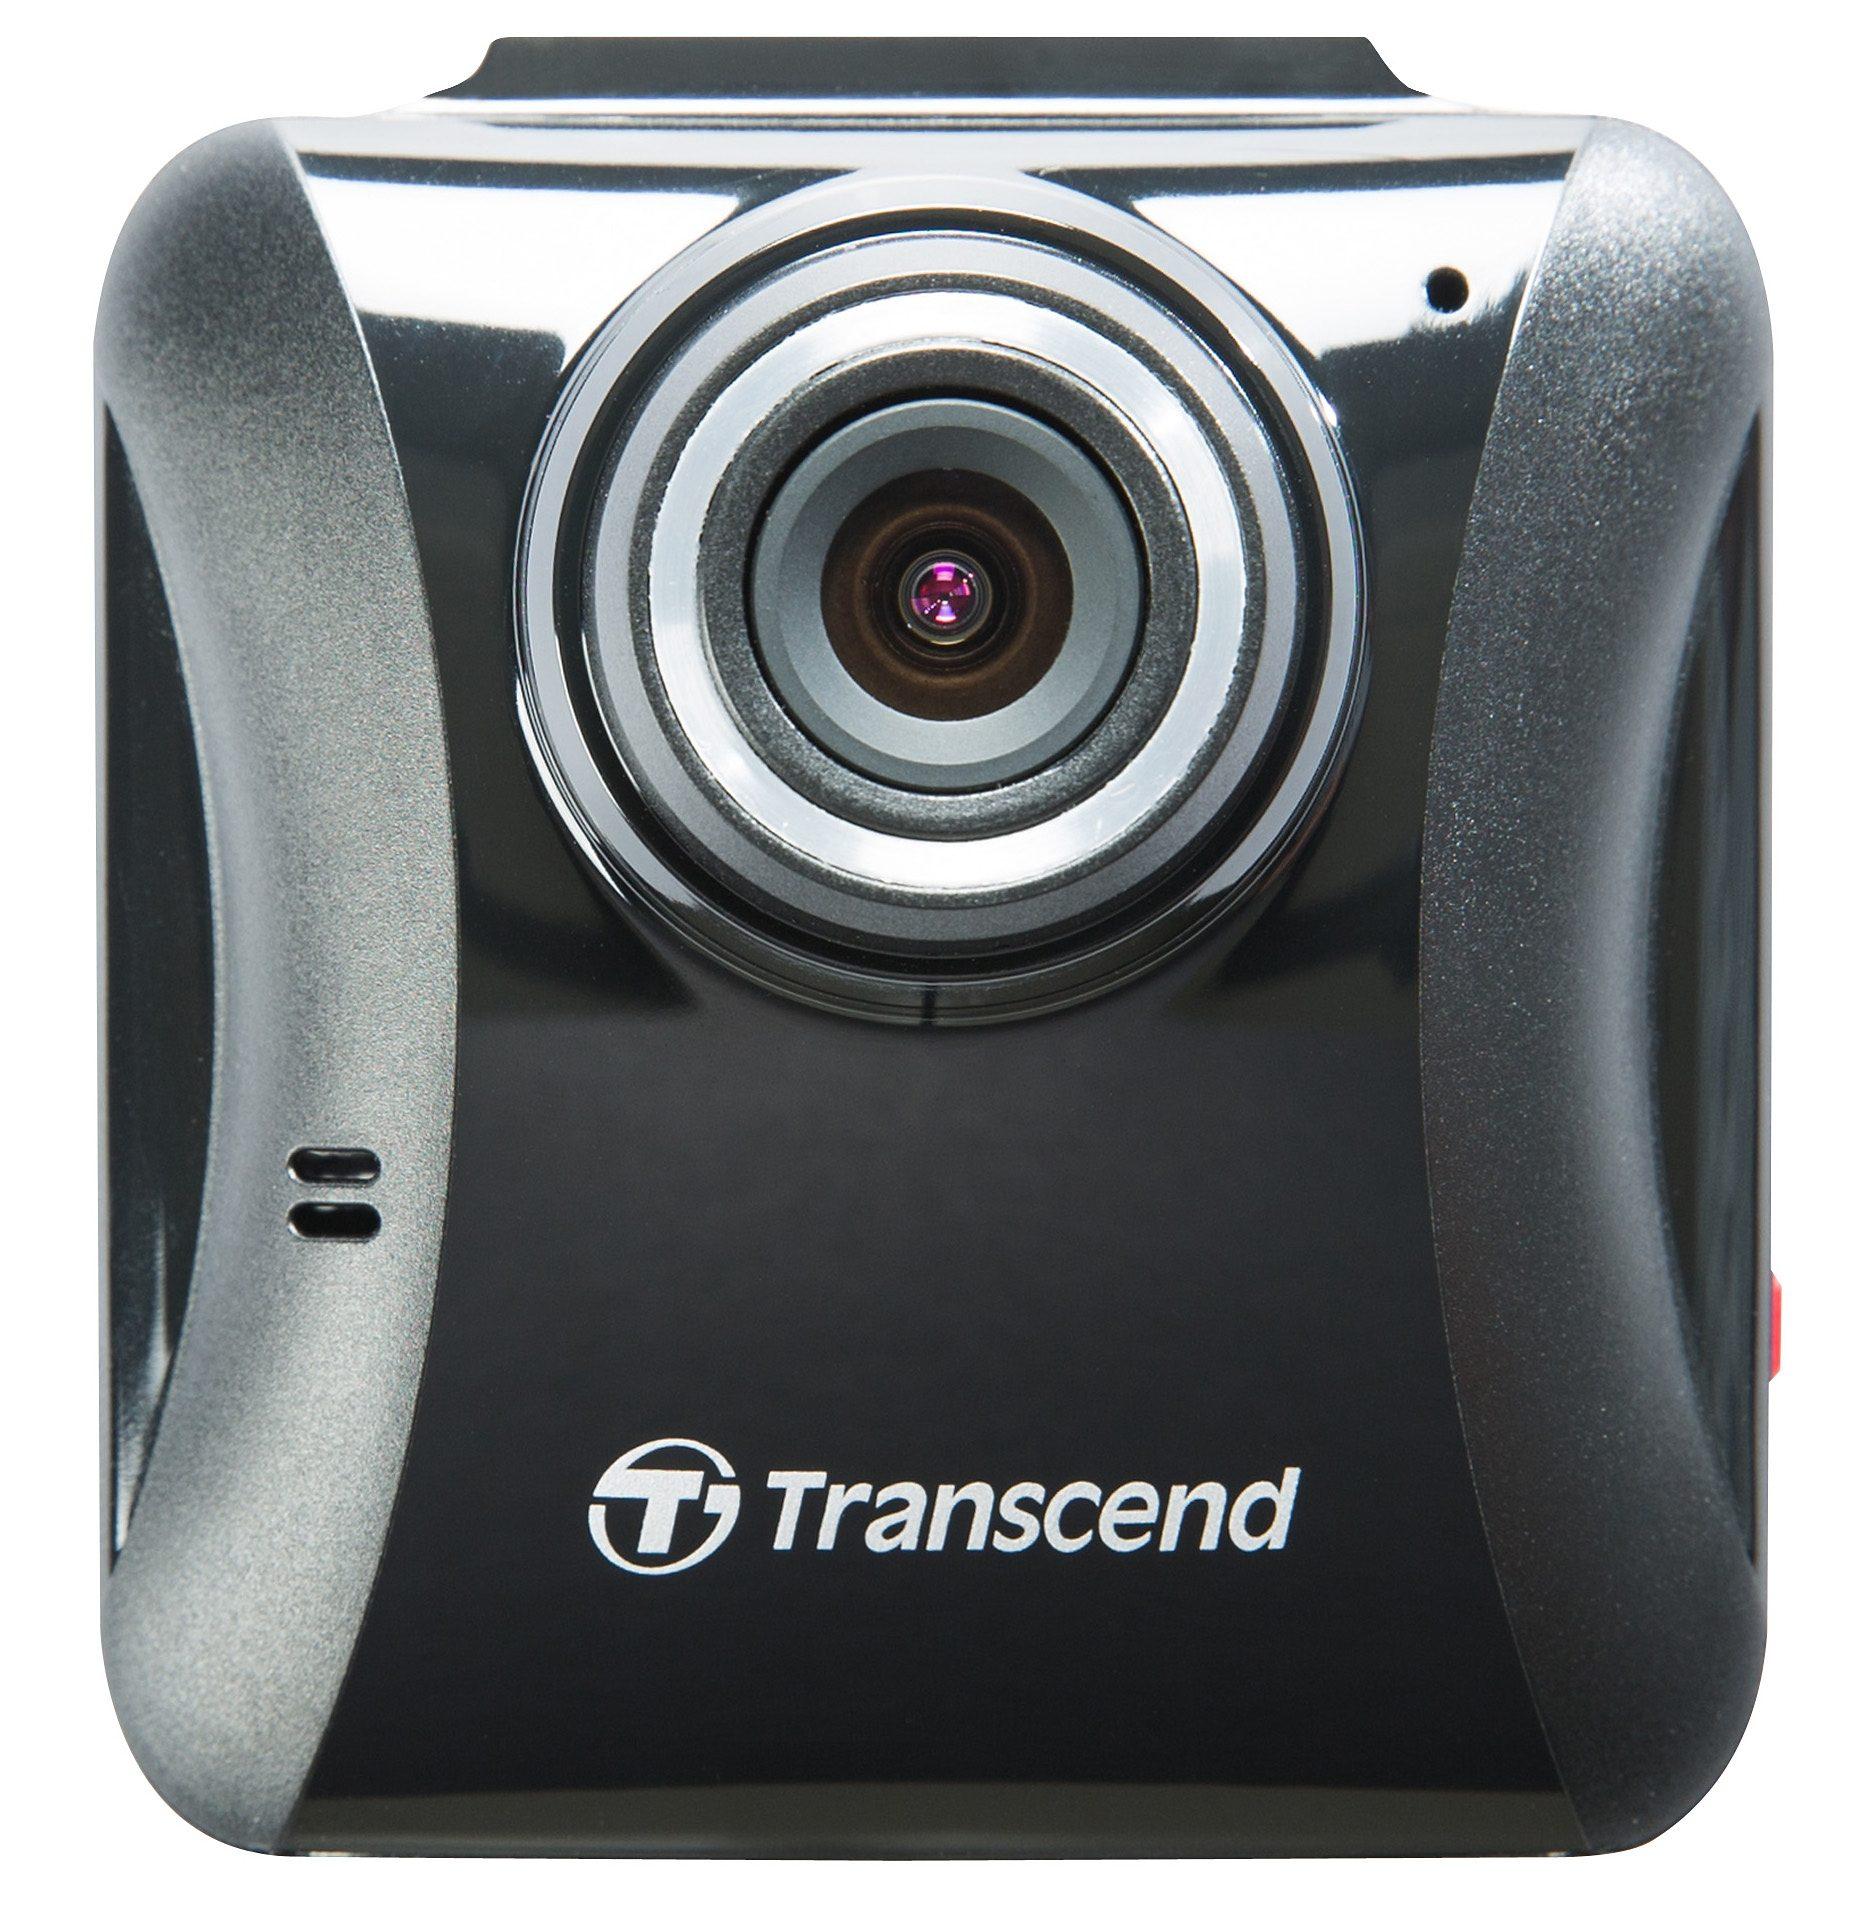 Transcend DrivePro 100 Auto-Kamera (Full HD) mit Saugnapfhalterung